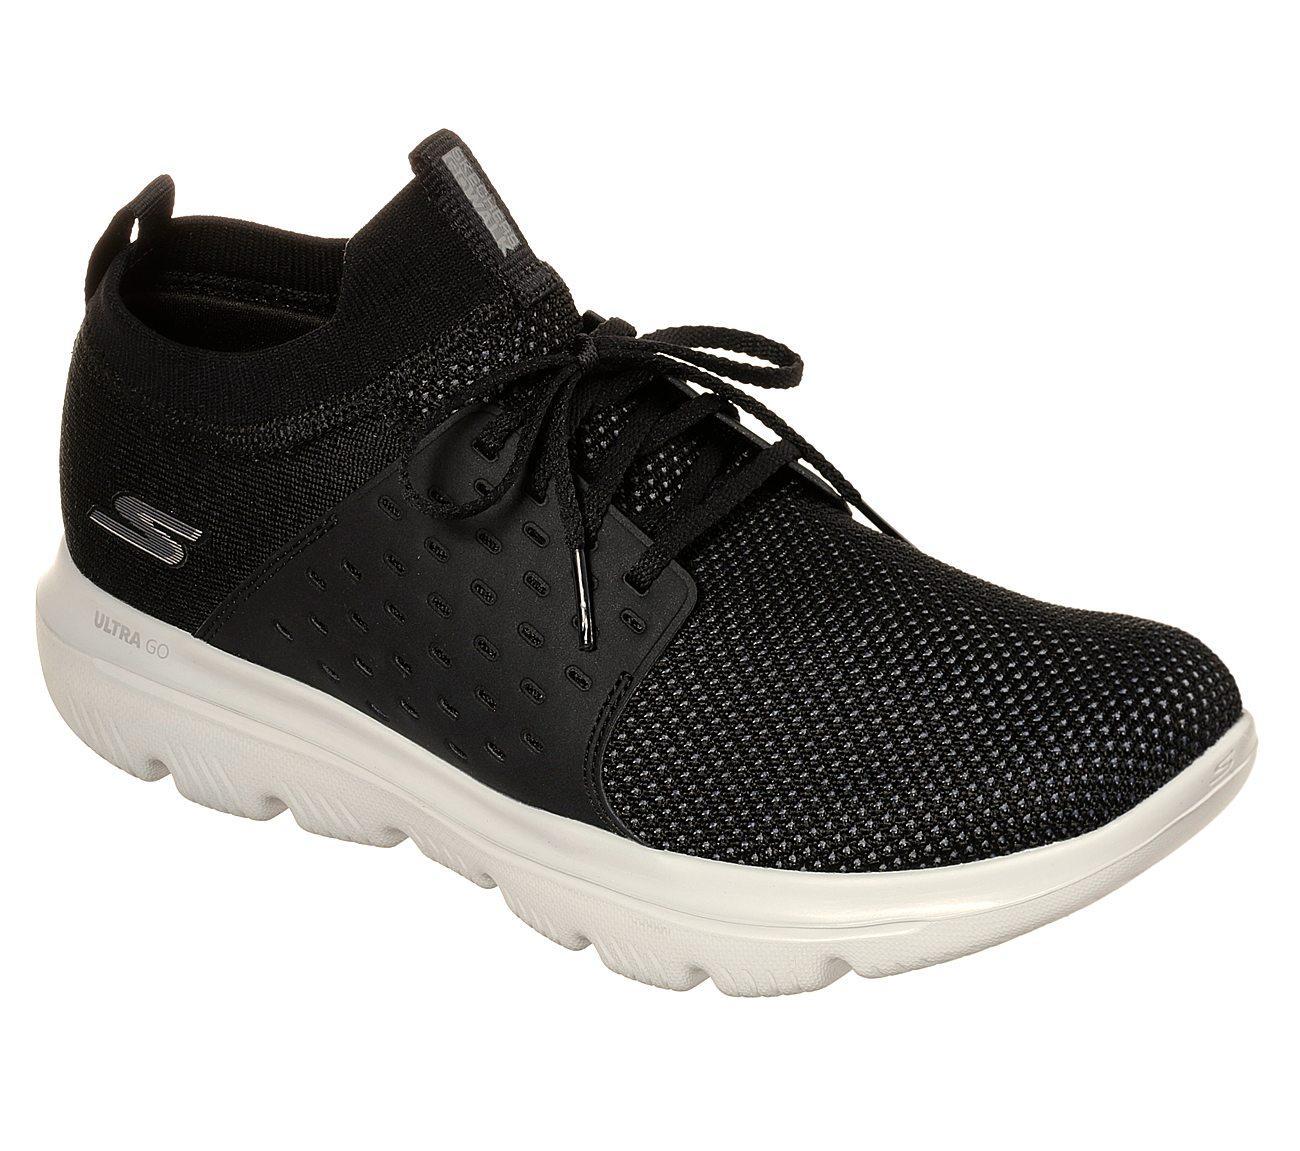 Skechers GOwalk Evolution Ultra Sepatu Sneakers Pria - Hitam 8d23d092ef